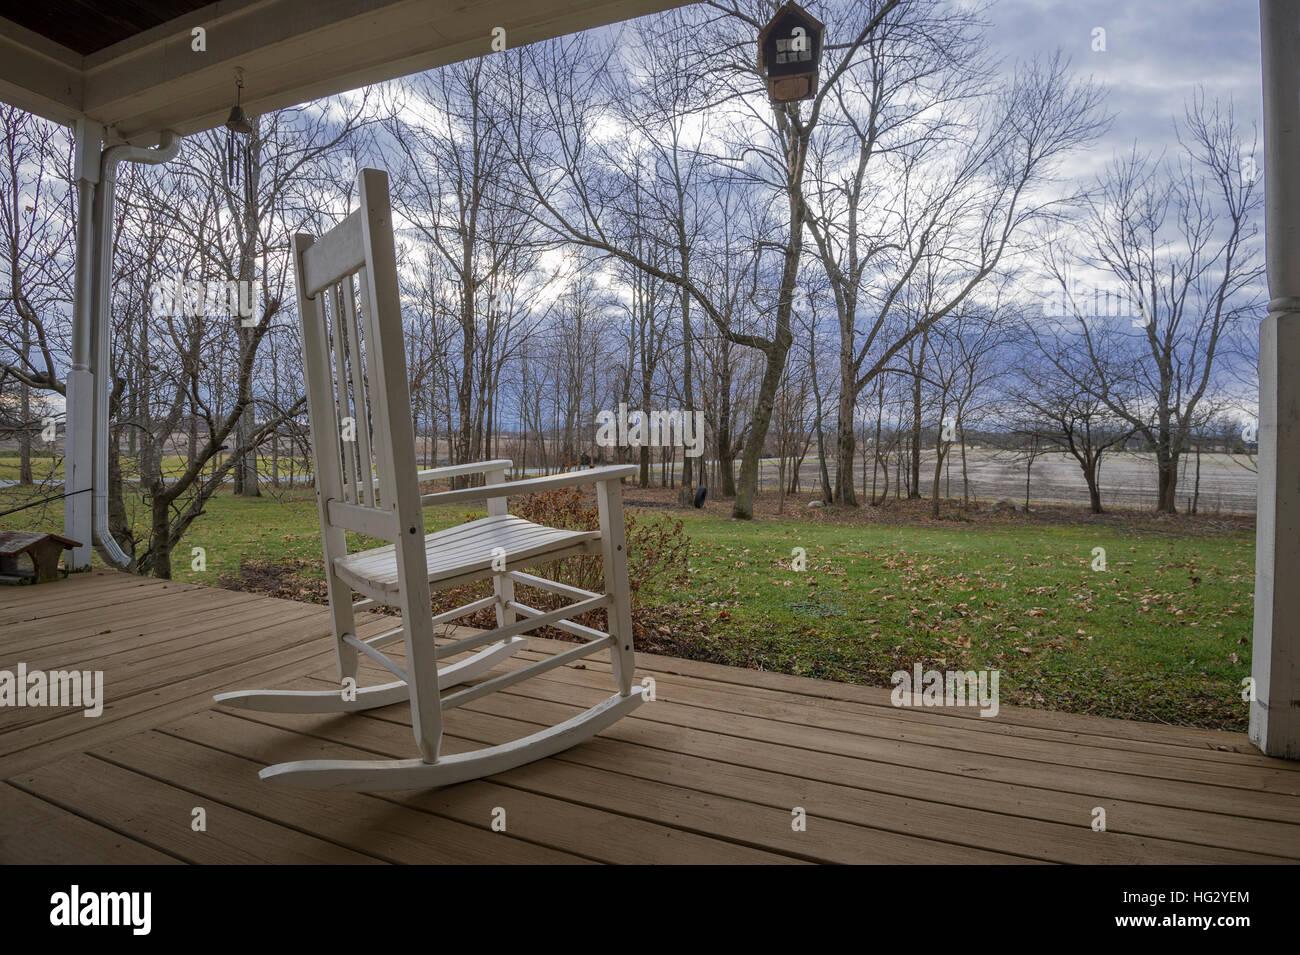 Amazing White Rocking Chair On Country Porch Stock Photo 130372556 Inzonedesignstudio Interior Chair Design Inzonedesignstudiocom